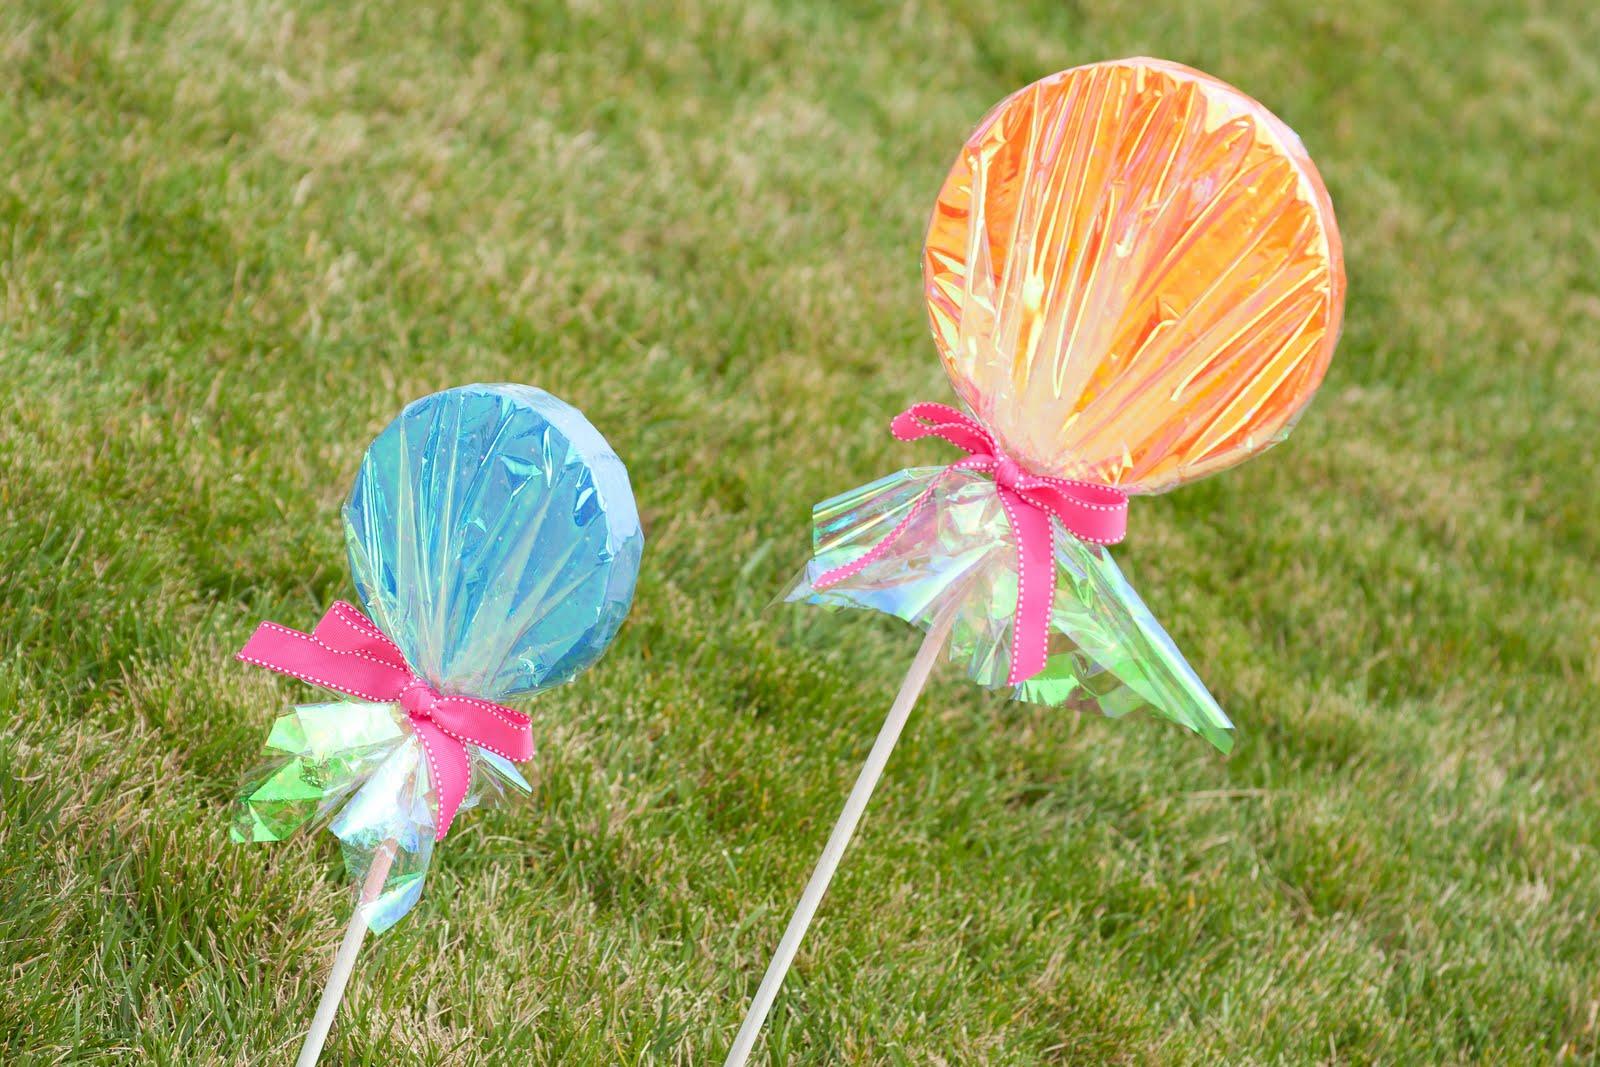 diy lollipop decorations how to make lollipop decorations glorious treats